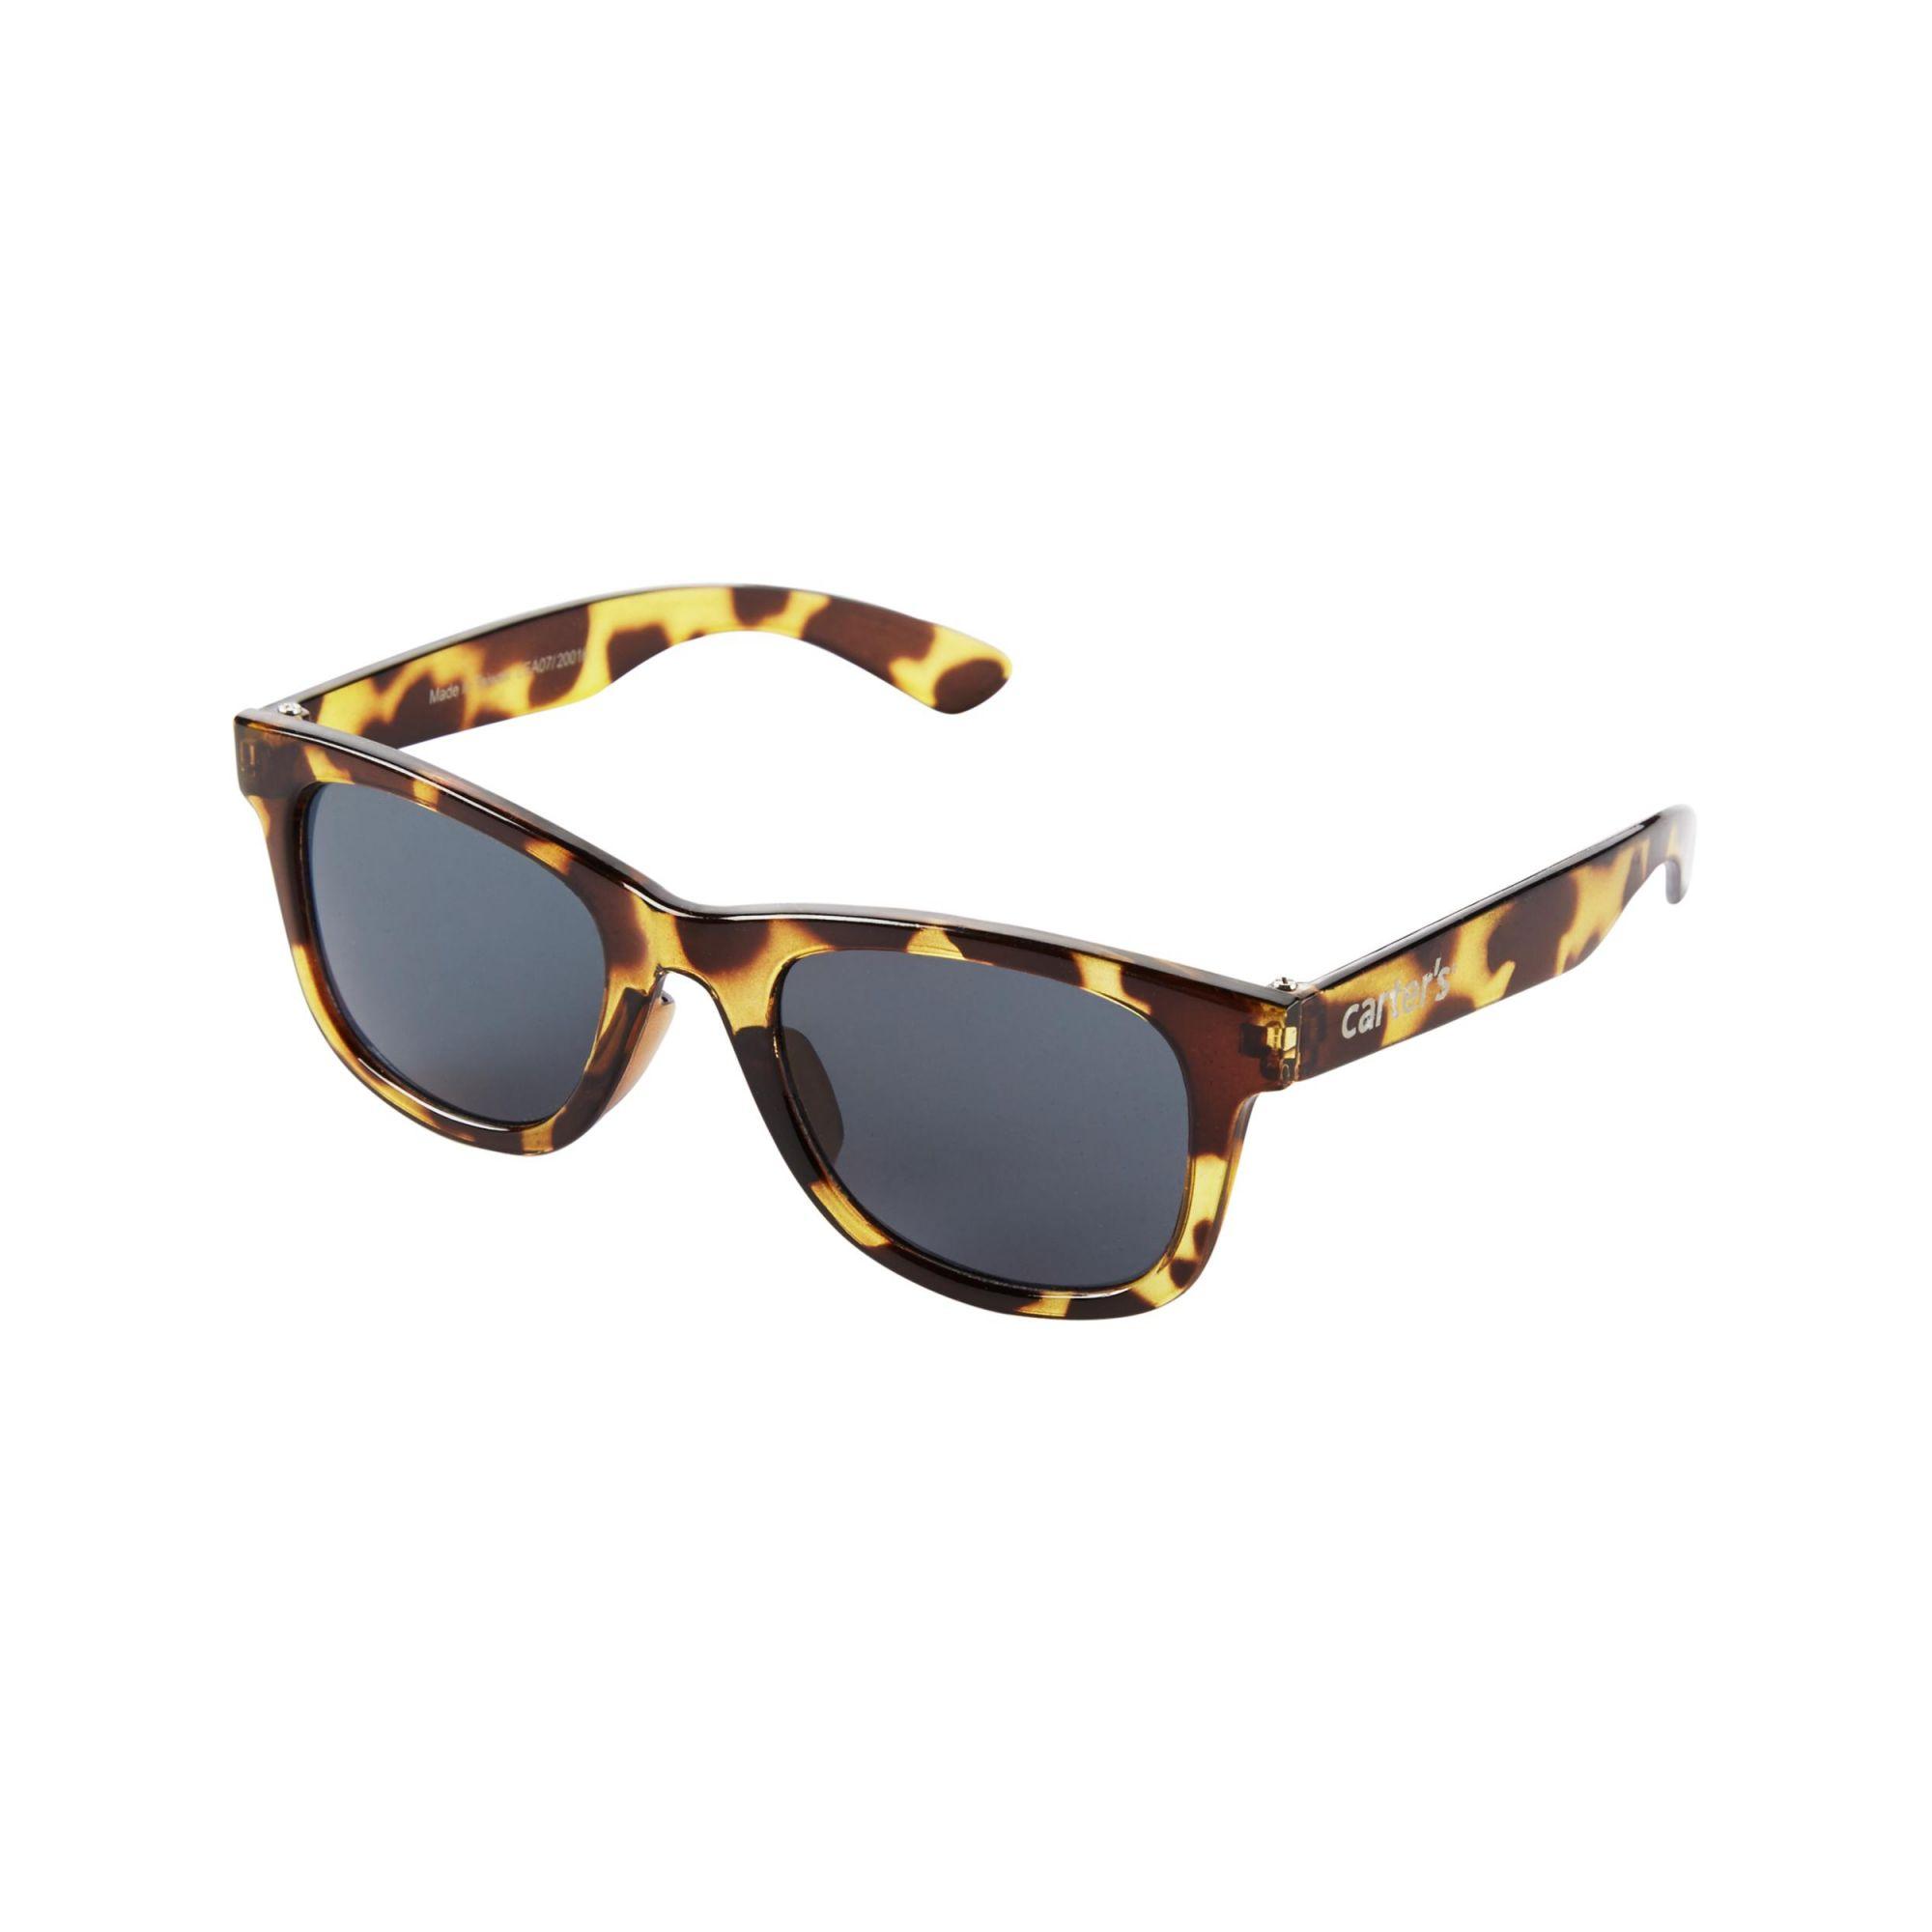 Óculos de sol estampa tartaruga - Carters  - Kaiuru Kids